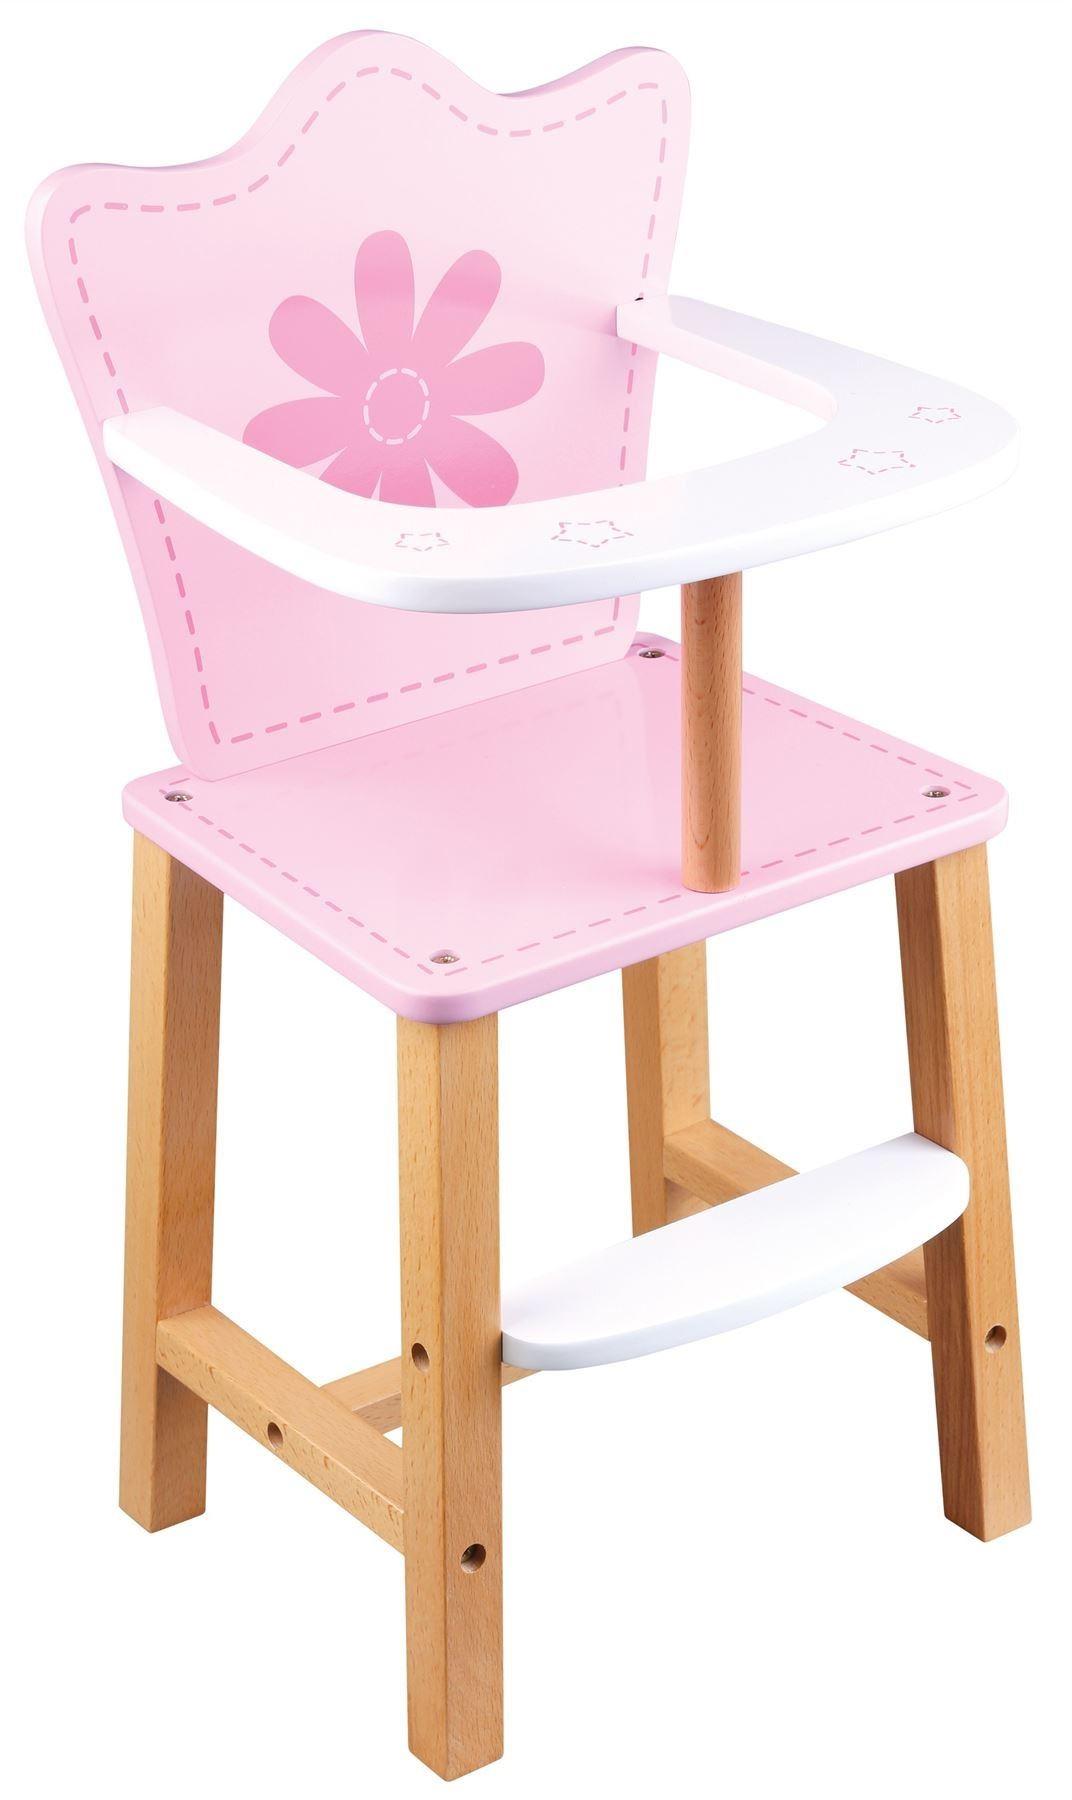 baby boy doll high chair farm style chairs lelin childrens pretend play house feeding